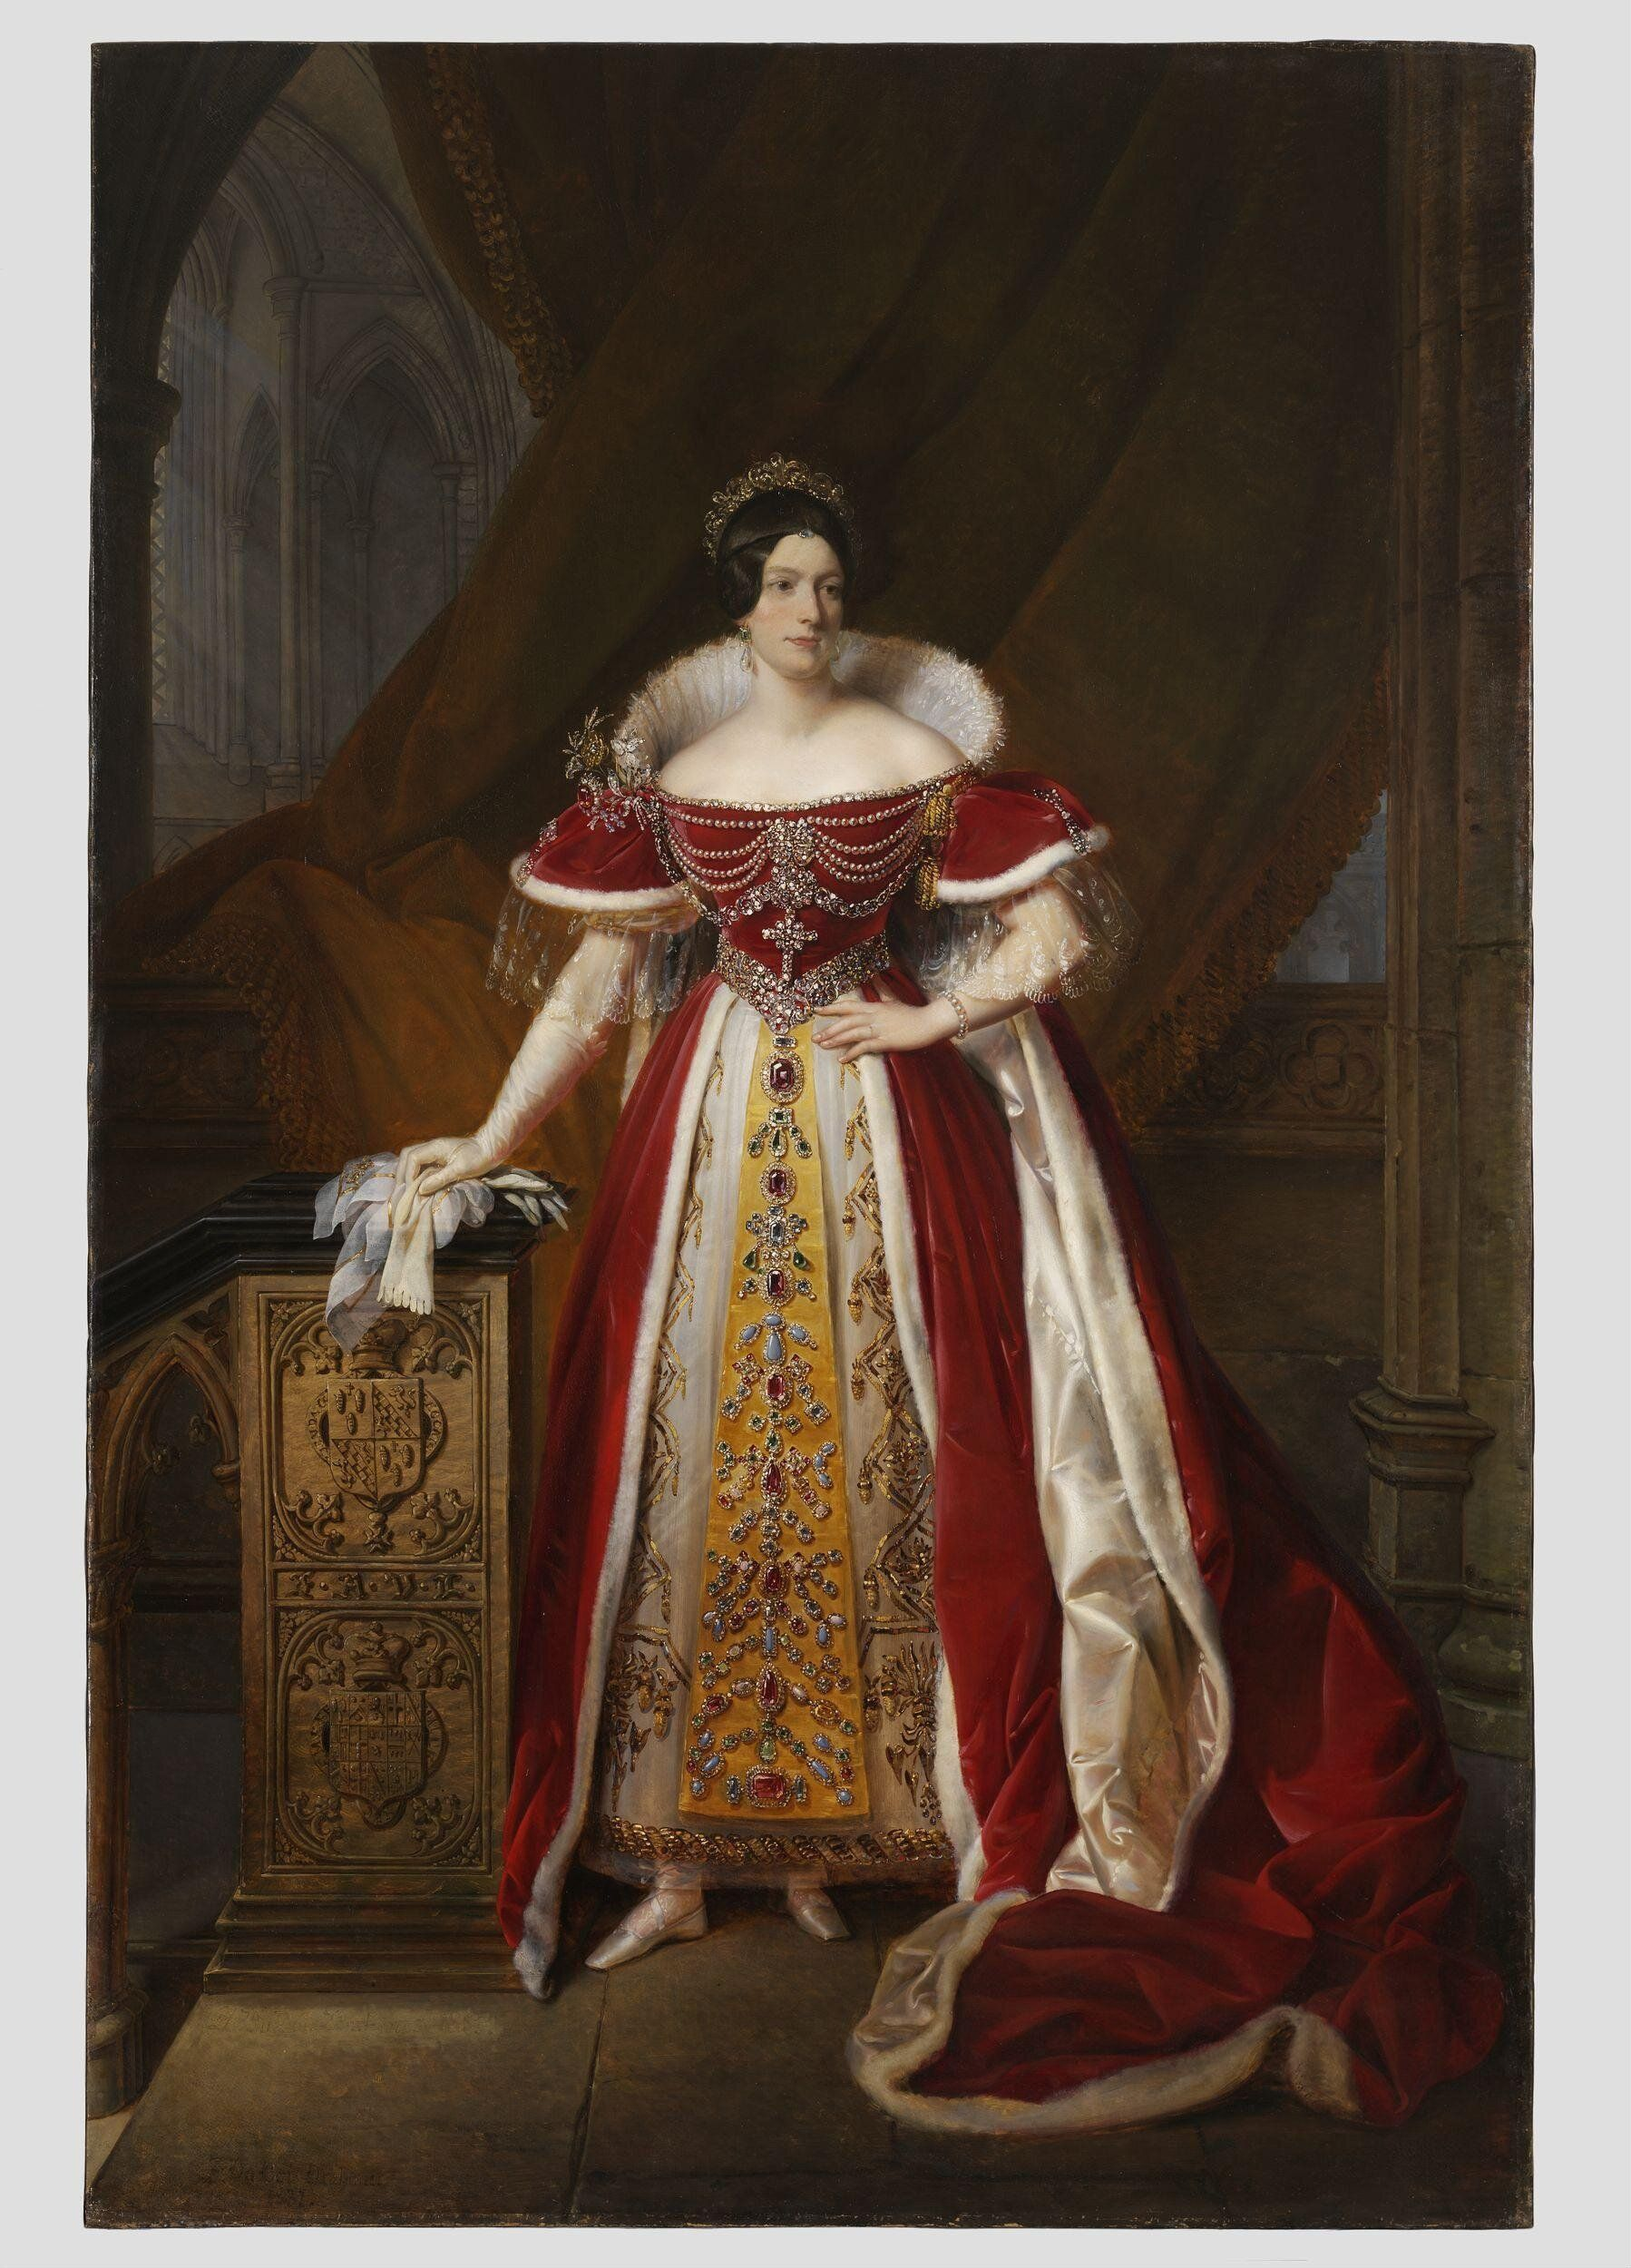 Portrait of Frances Anne Vane, Marchioness of Londonderry